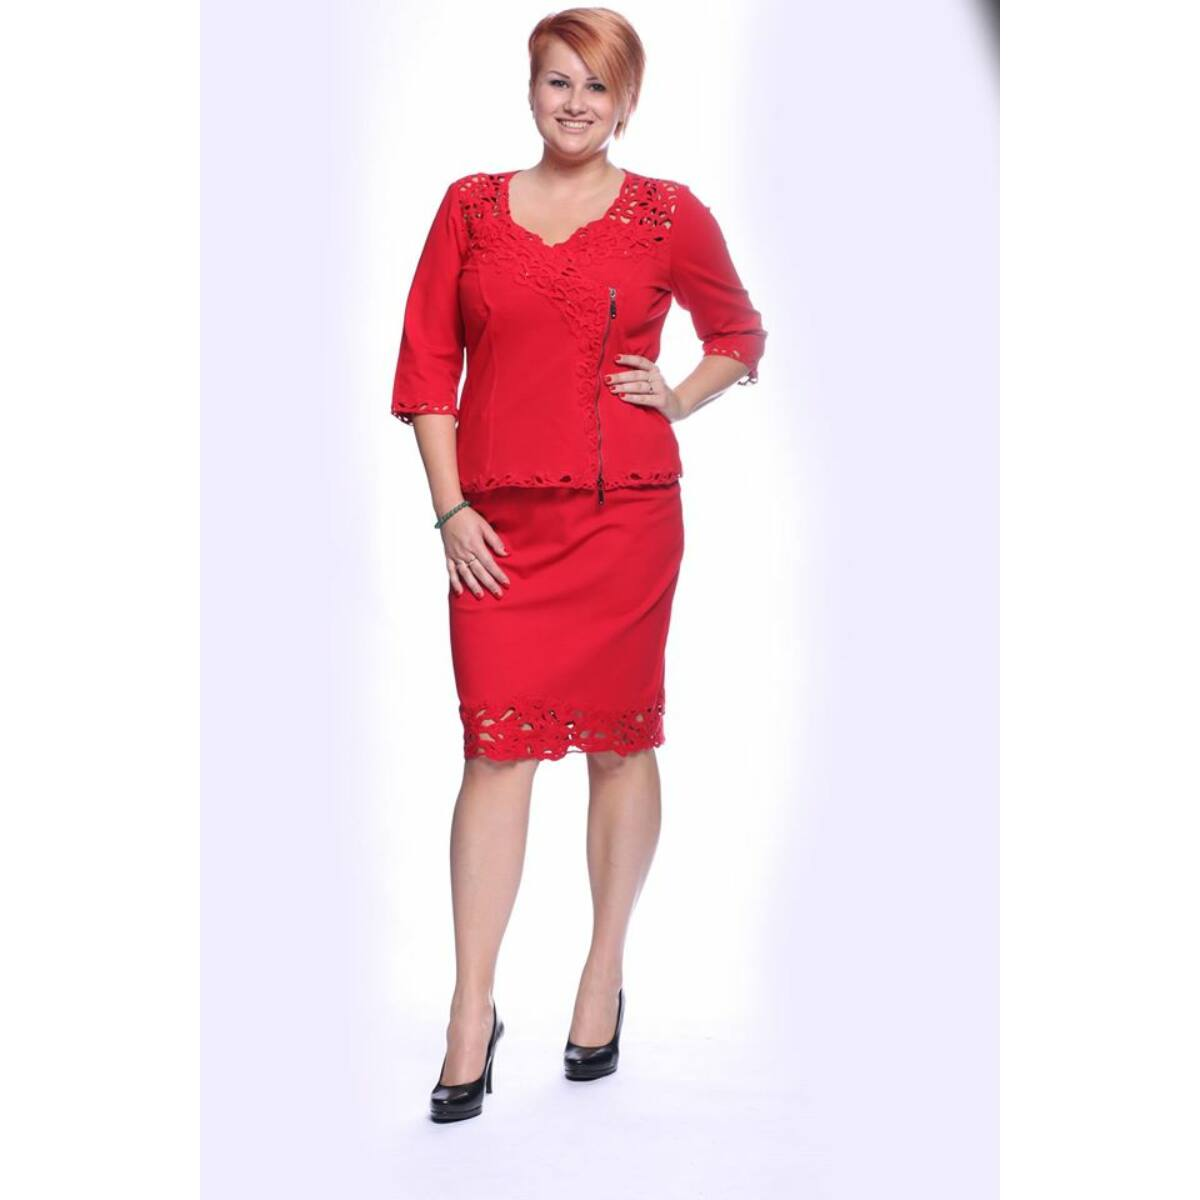 Nancy szoknya - plus size Lafei-Nier piros csipke szoknya